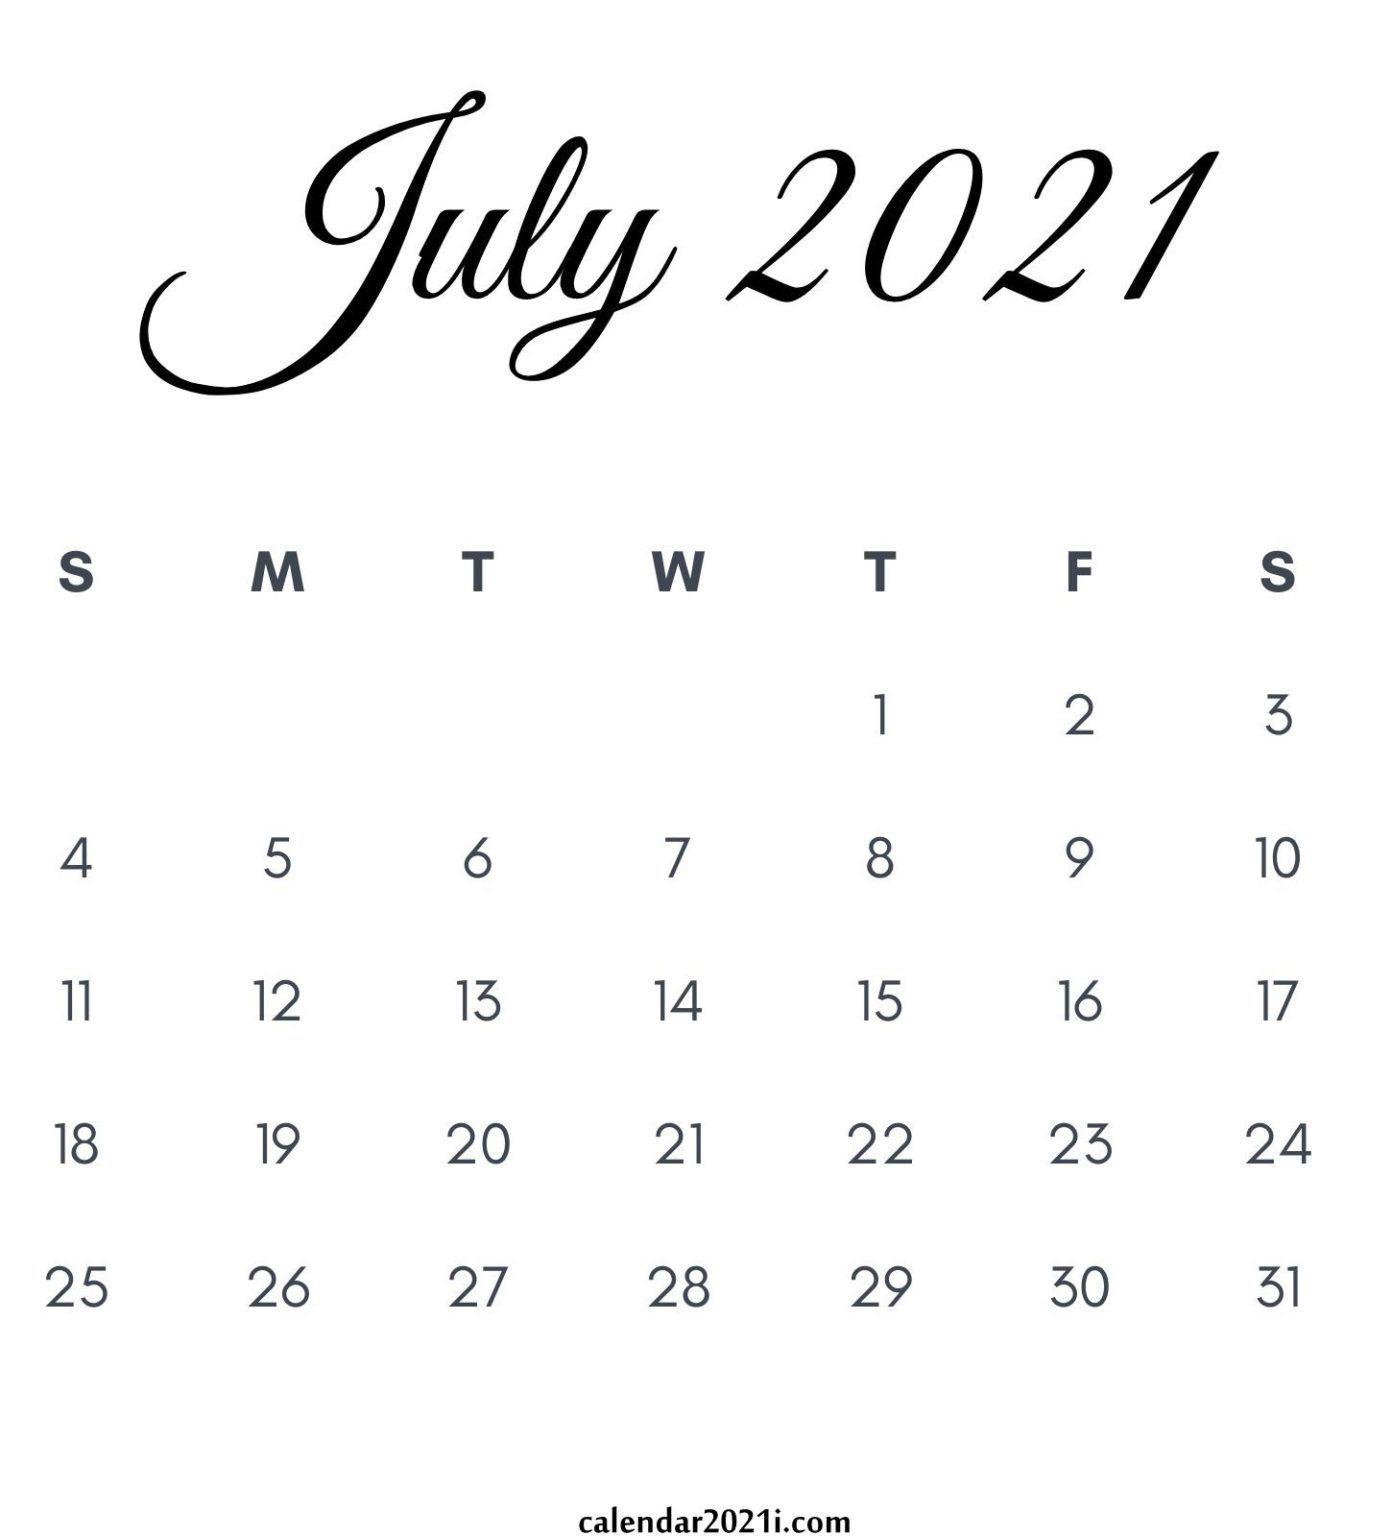 July 2021 Calendar Printable | Printable Calendar July